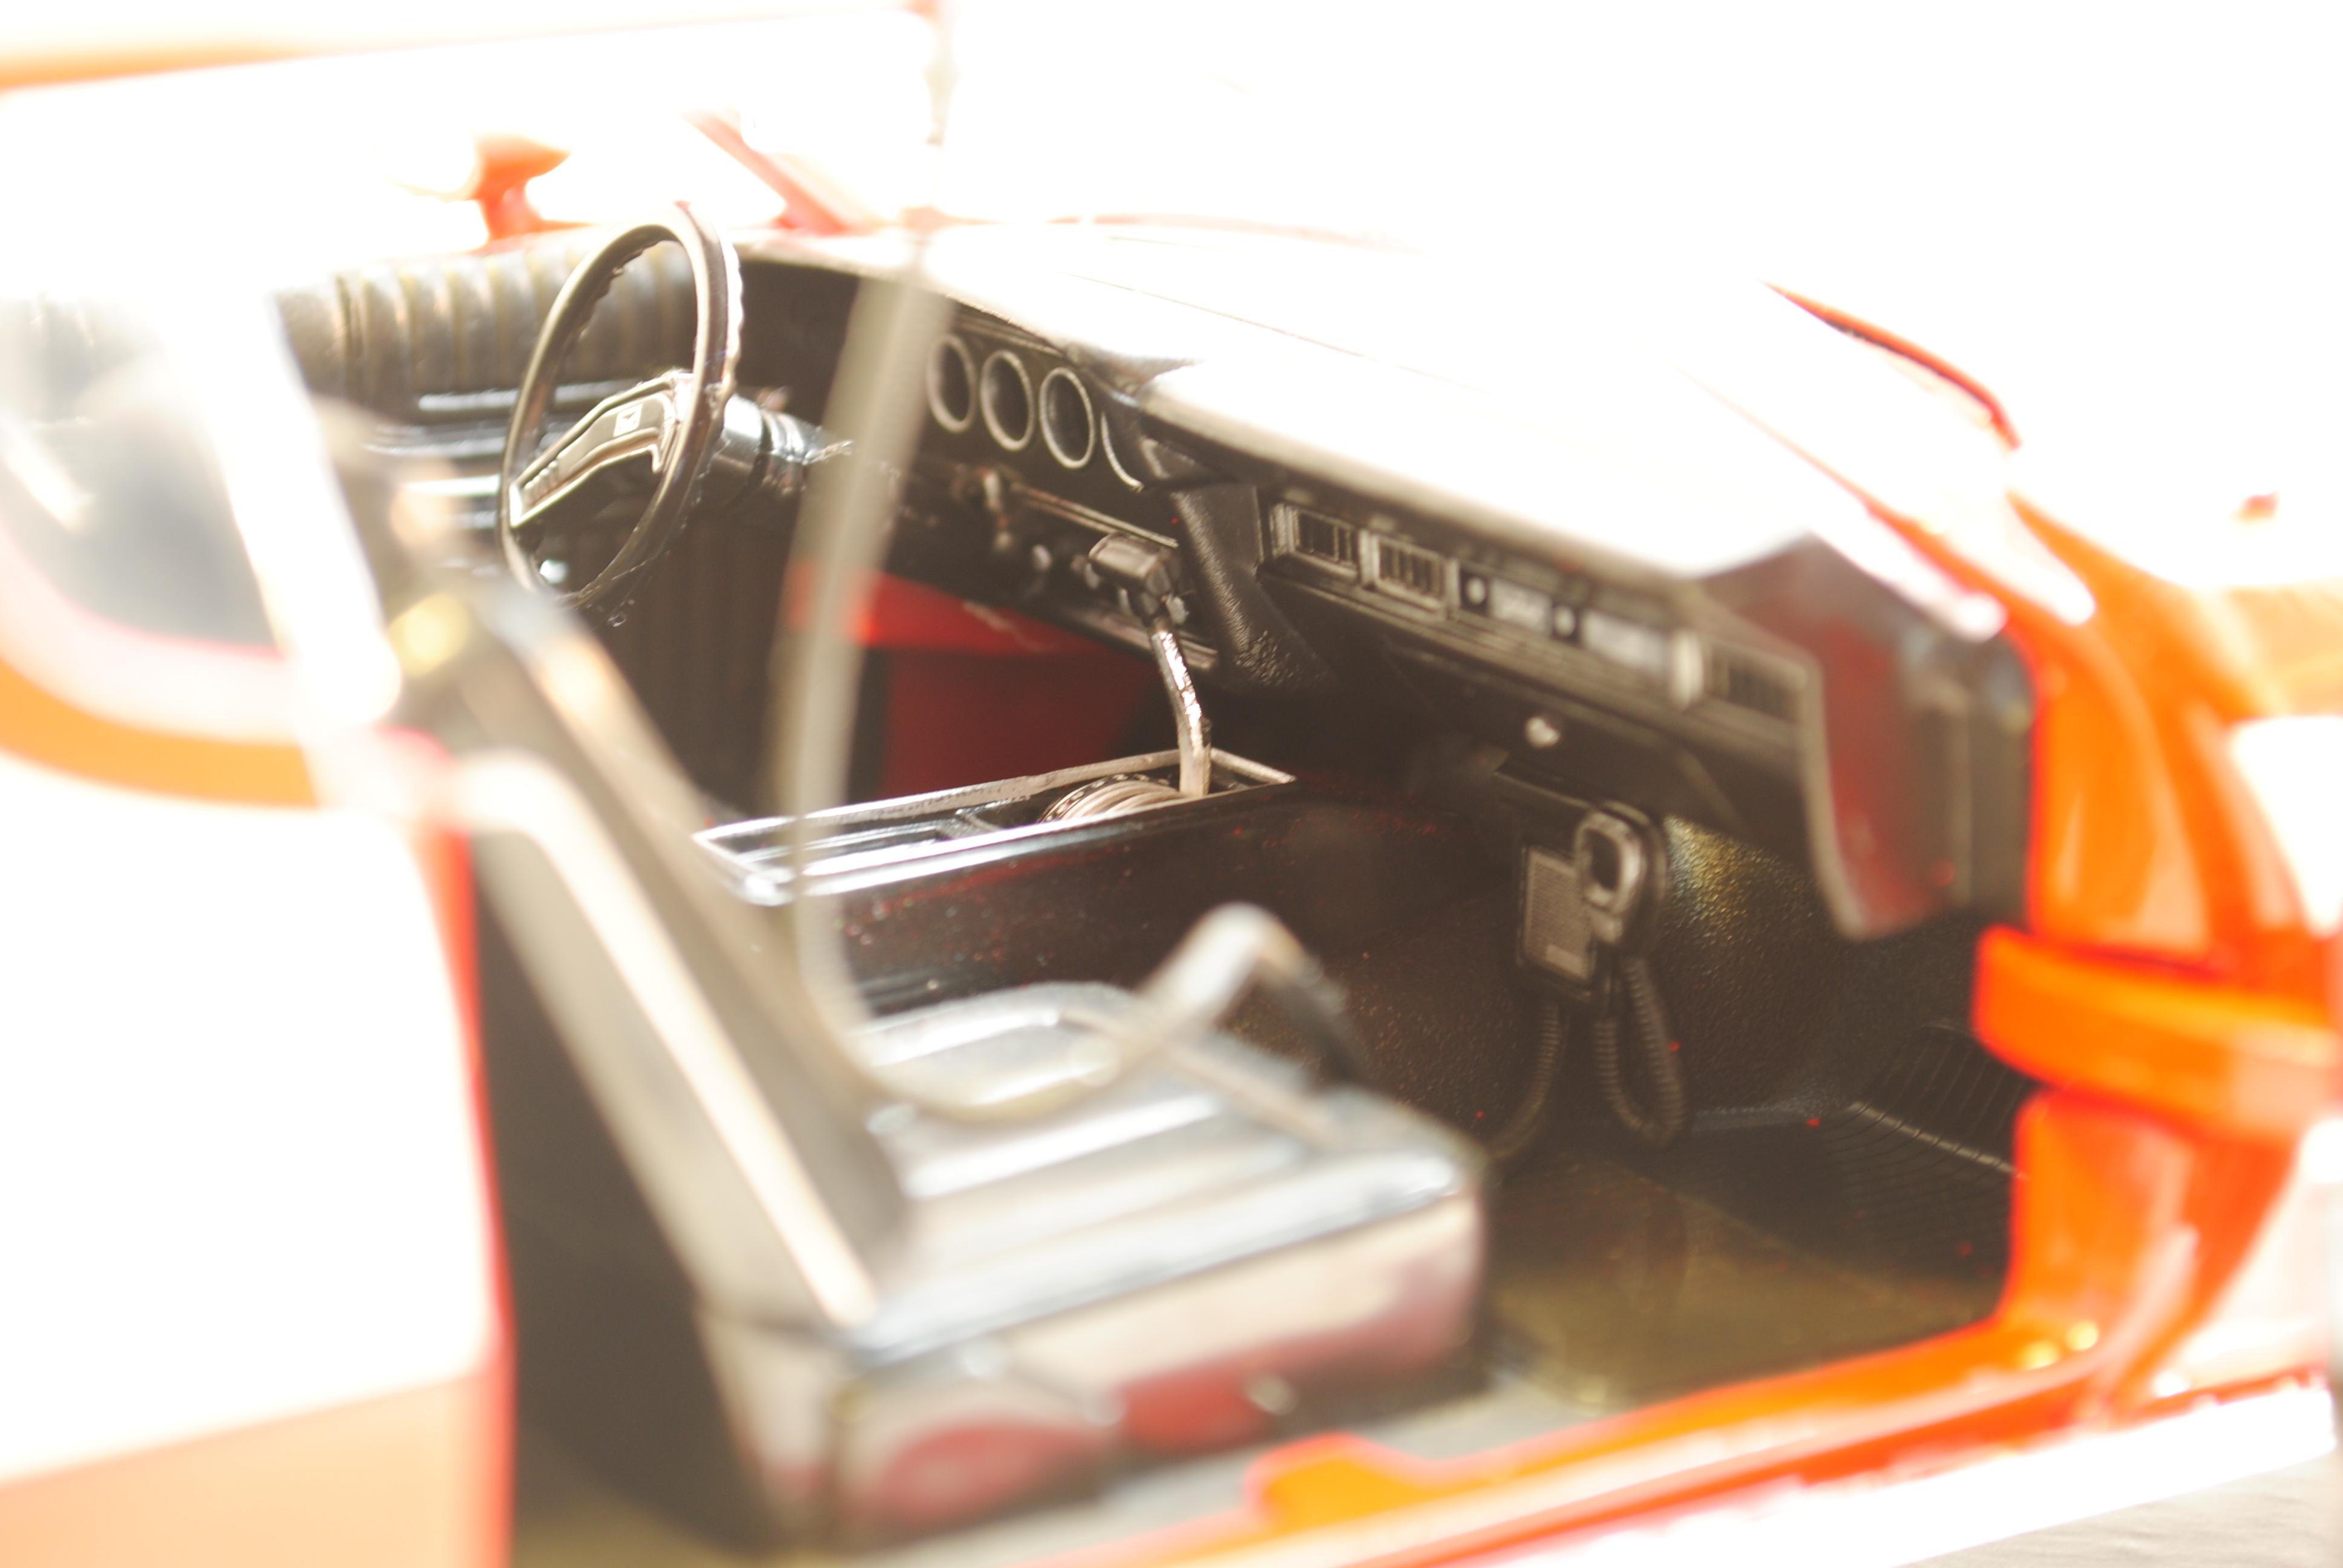 1976 ford gran torino starsky hutch 1 18 ertl model car motorscotti. Black Bedroom Furniture Sets. Home Design Ideas